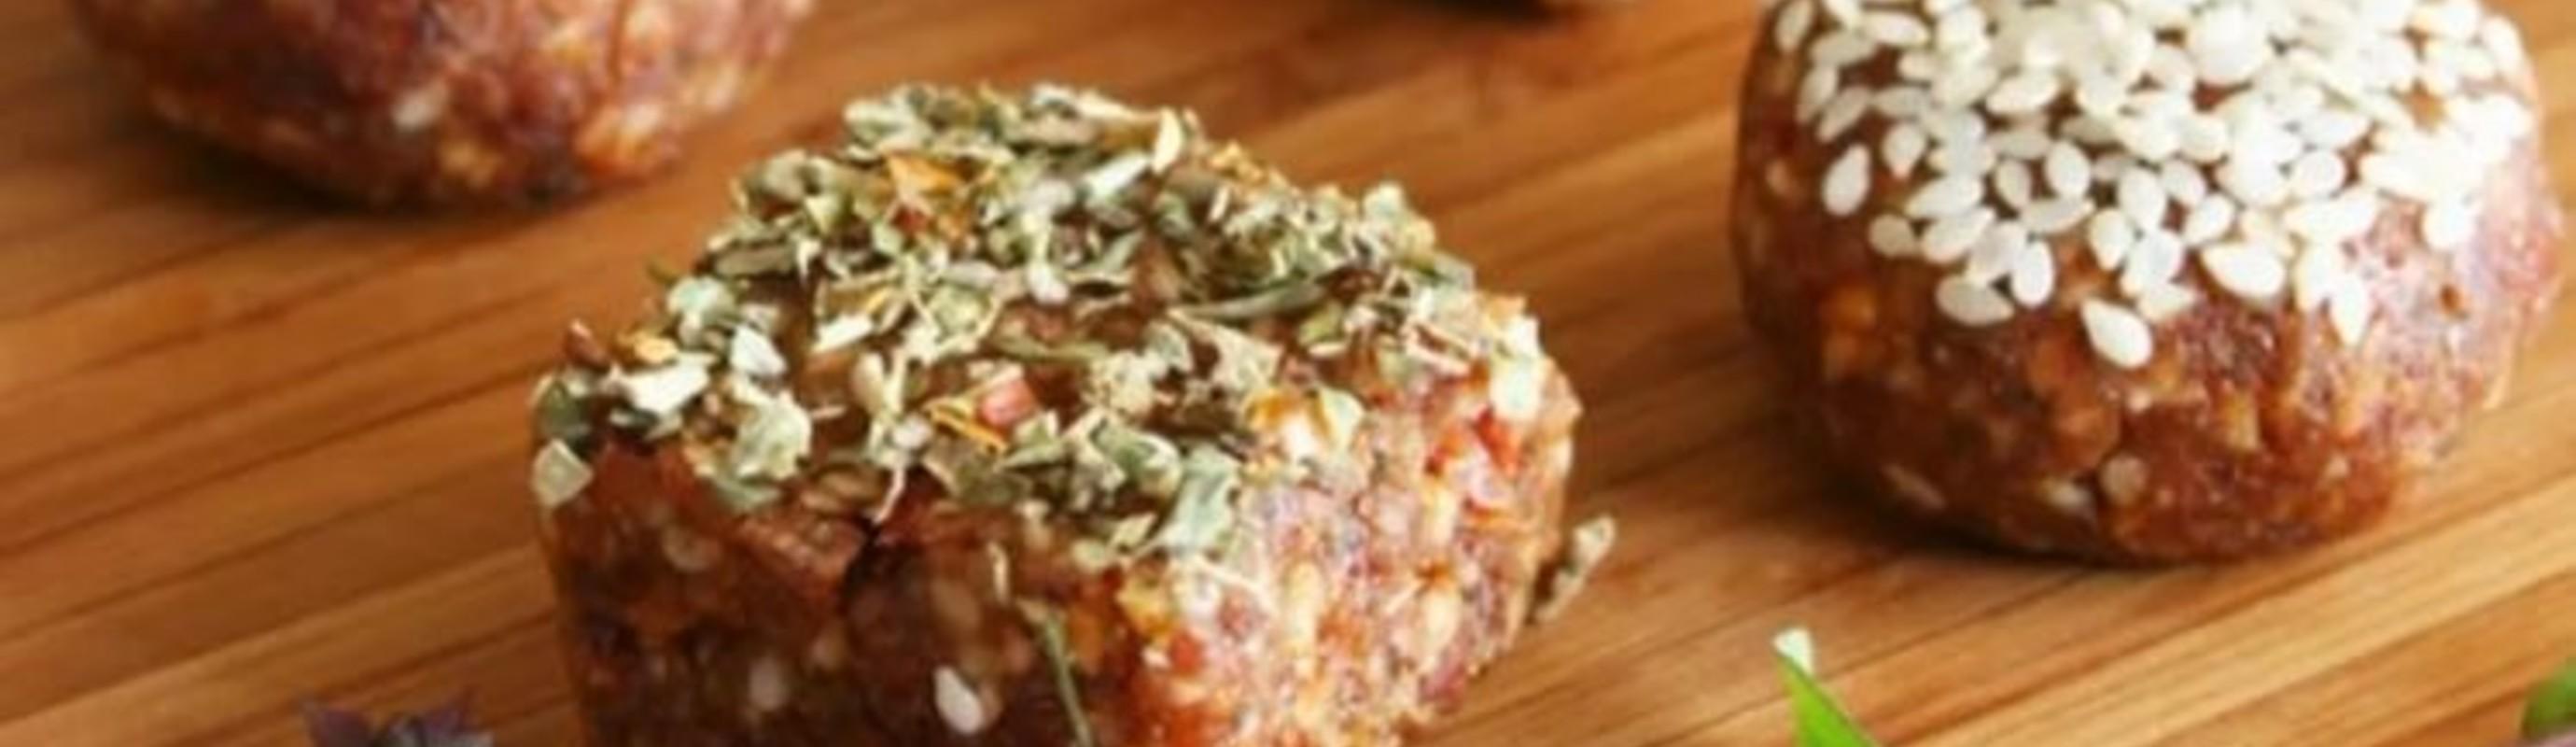 Sun Dried Tomato Raw Vegan Truffles